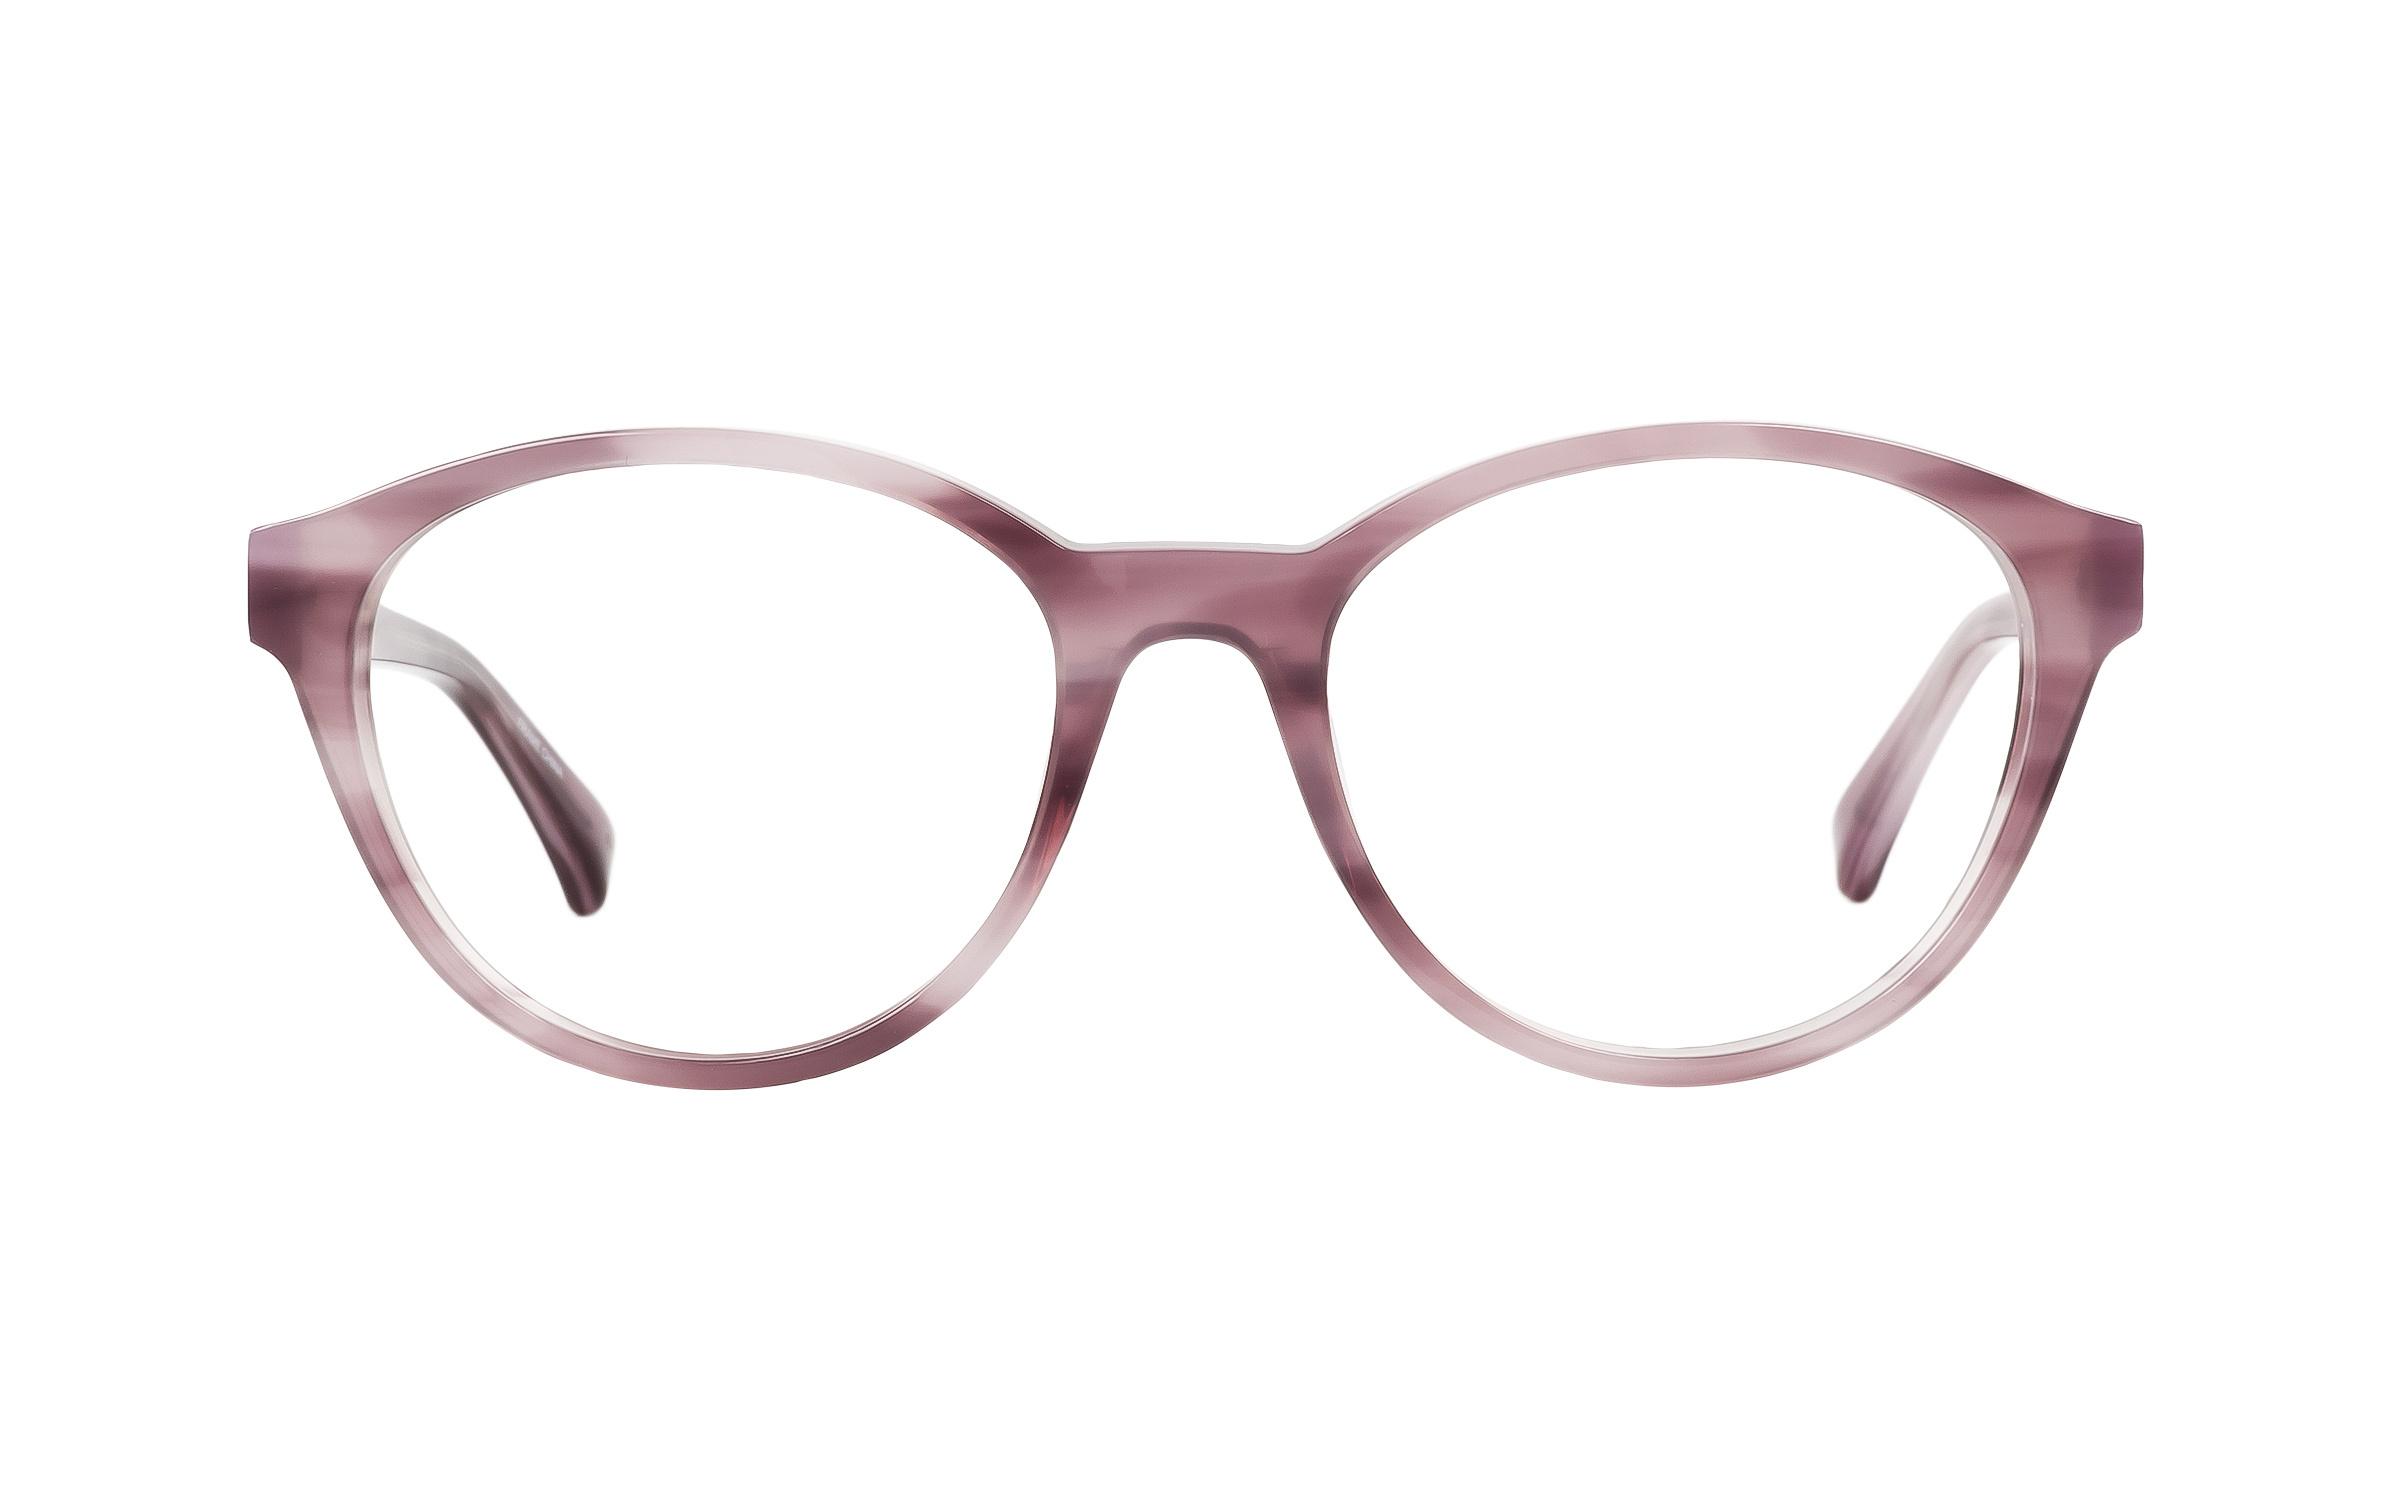 Calvin klein eyeglass frames | Eyeglasses | Compare Prices at Nextag